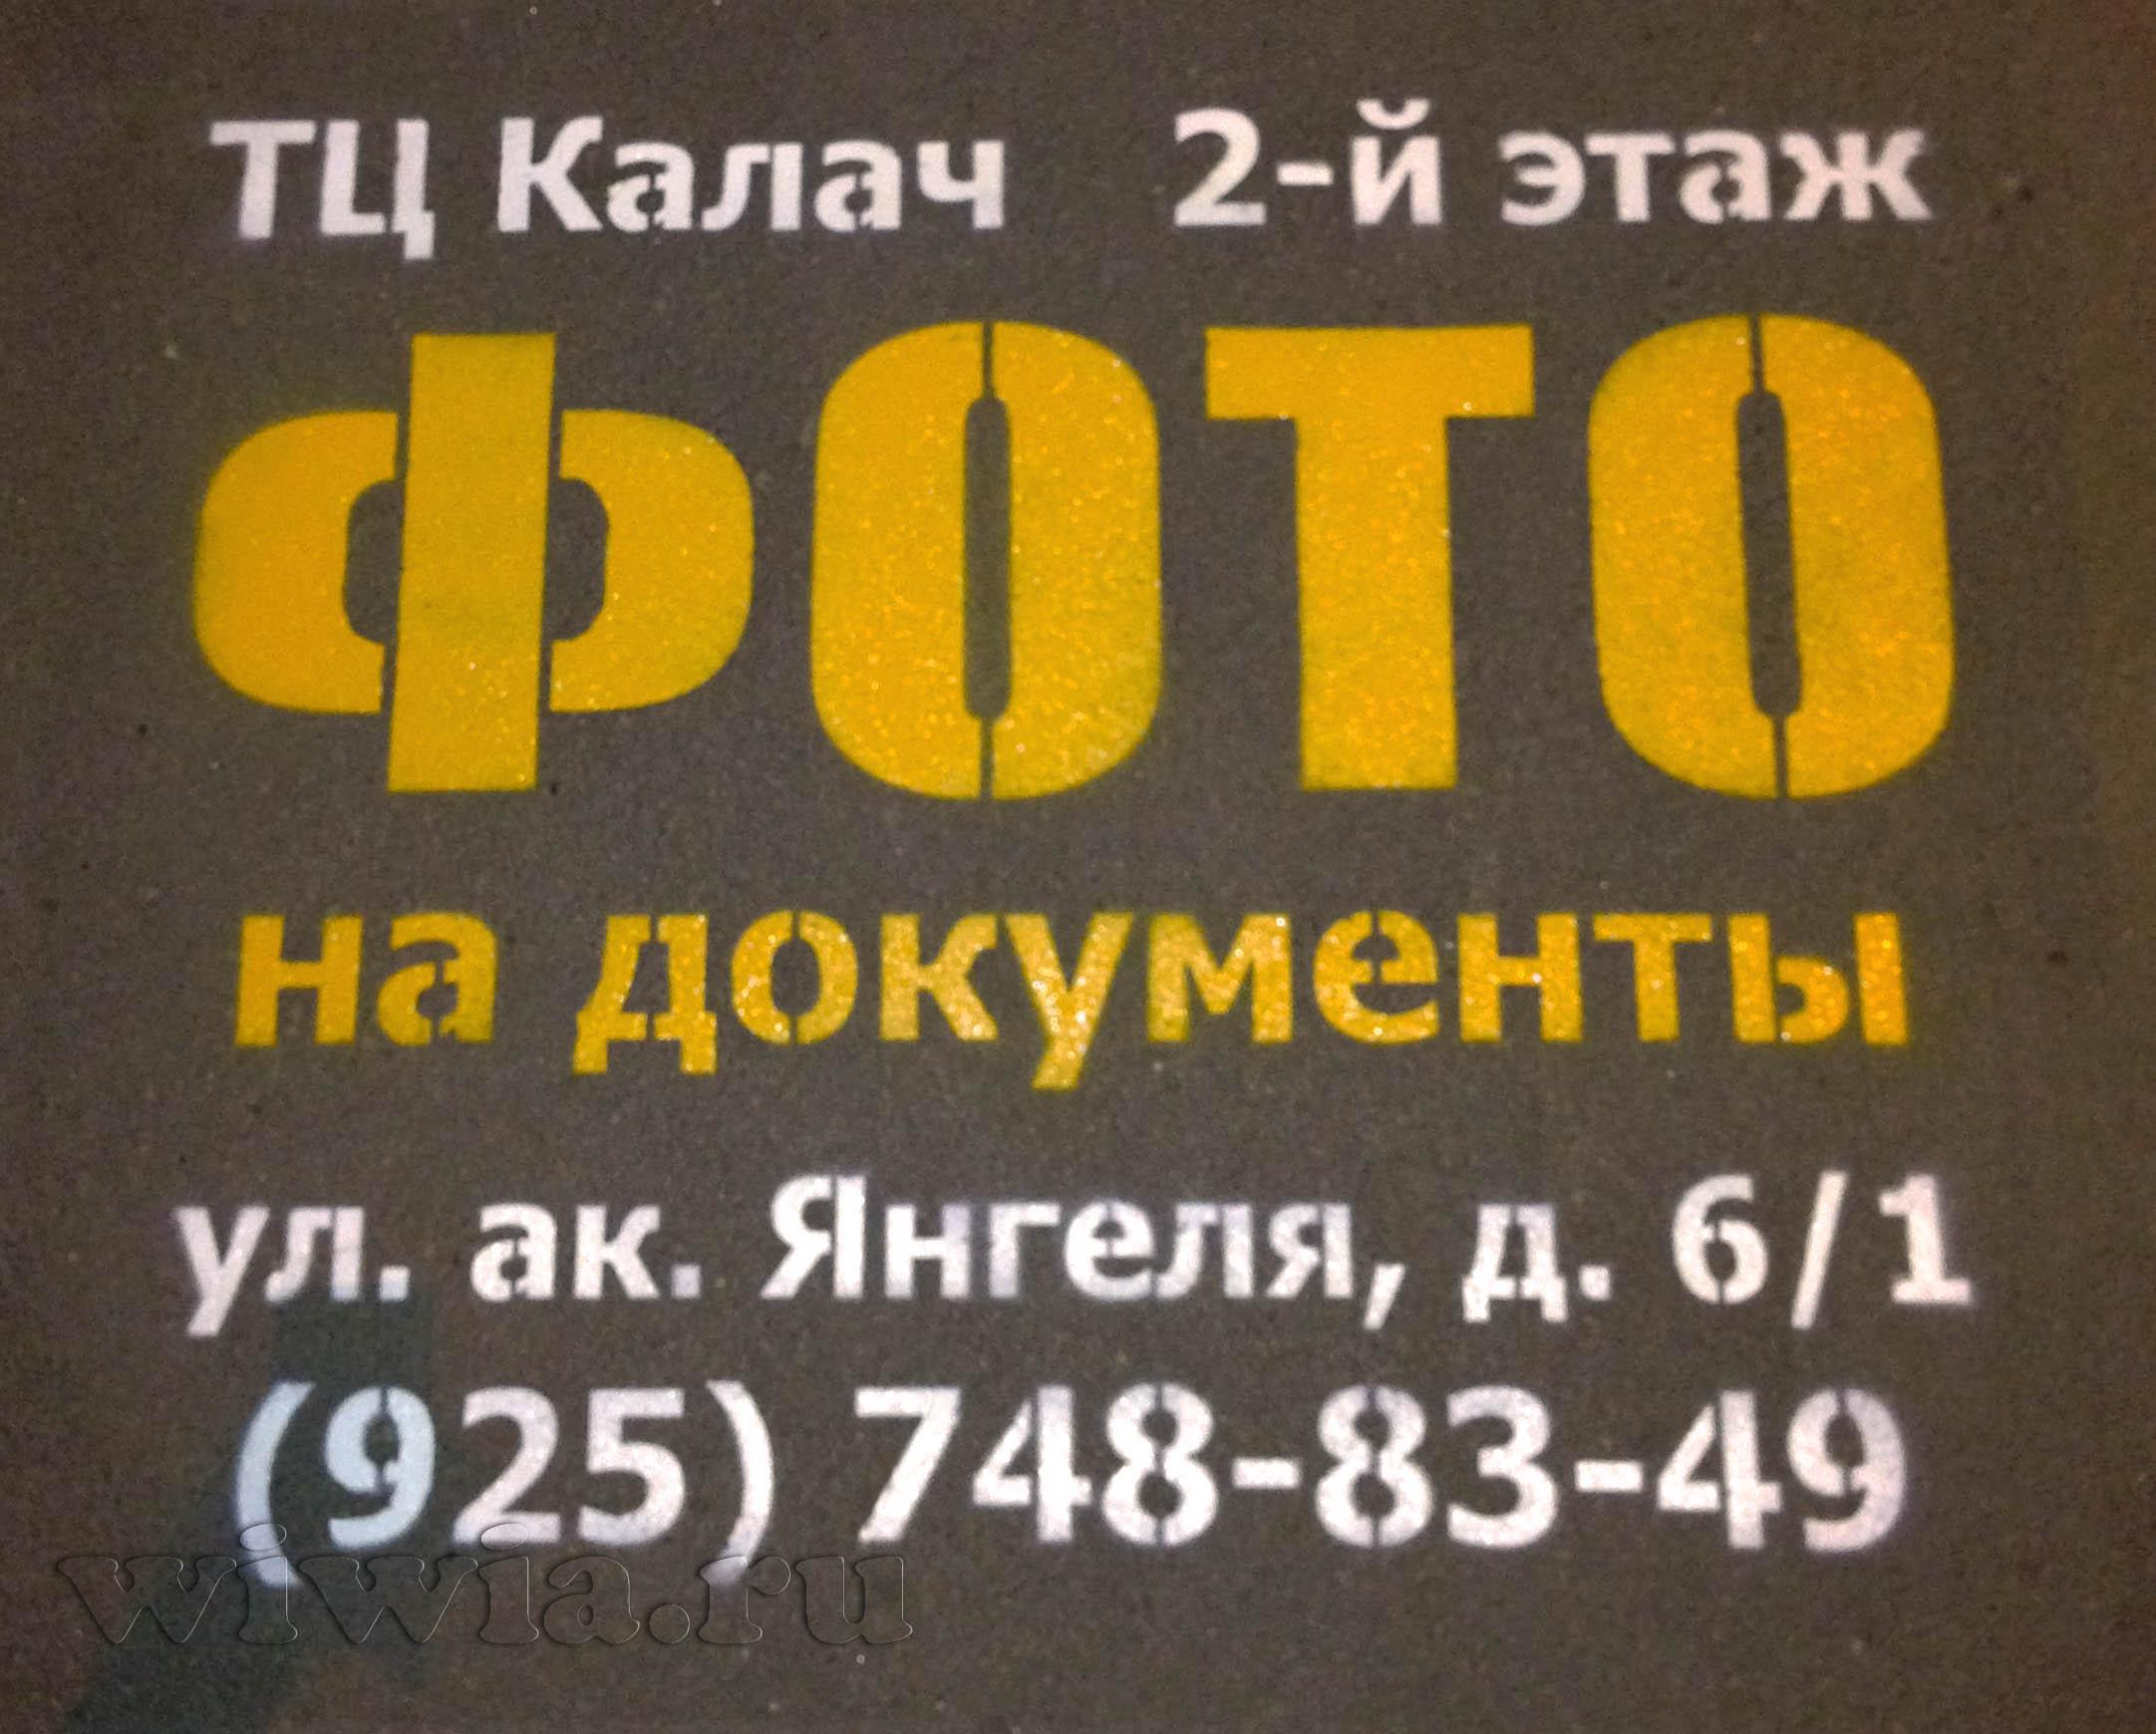 Реклама на асфальте. Фото.